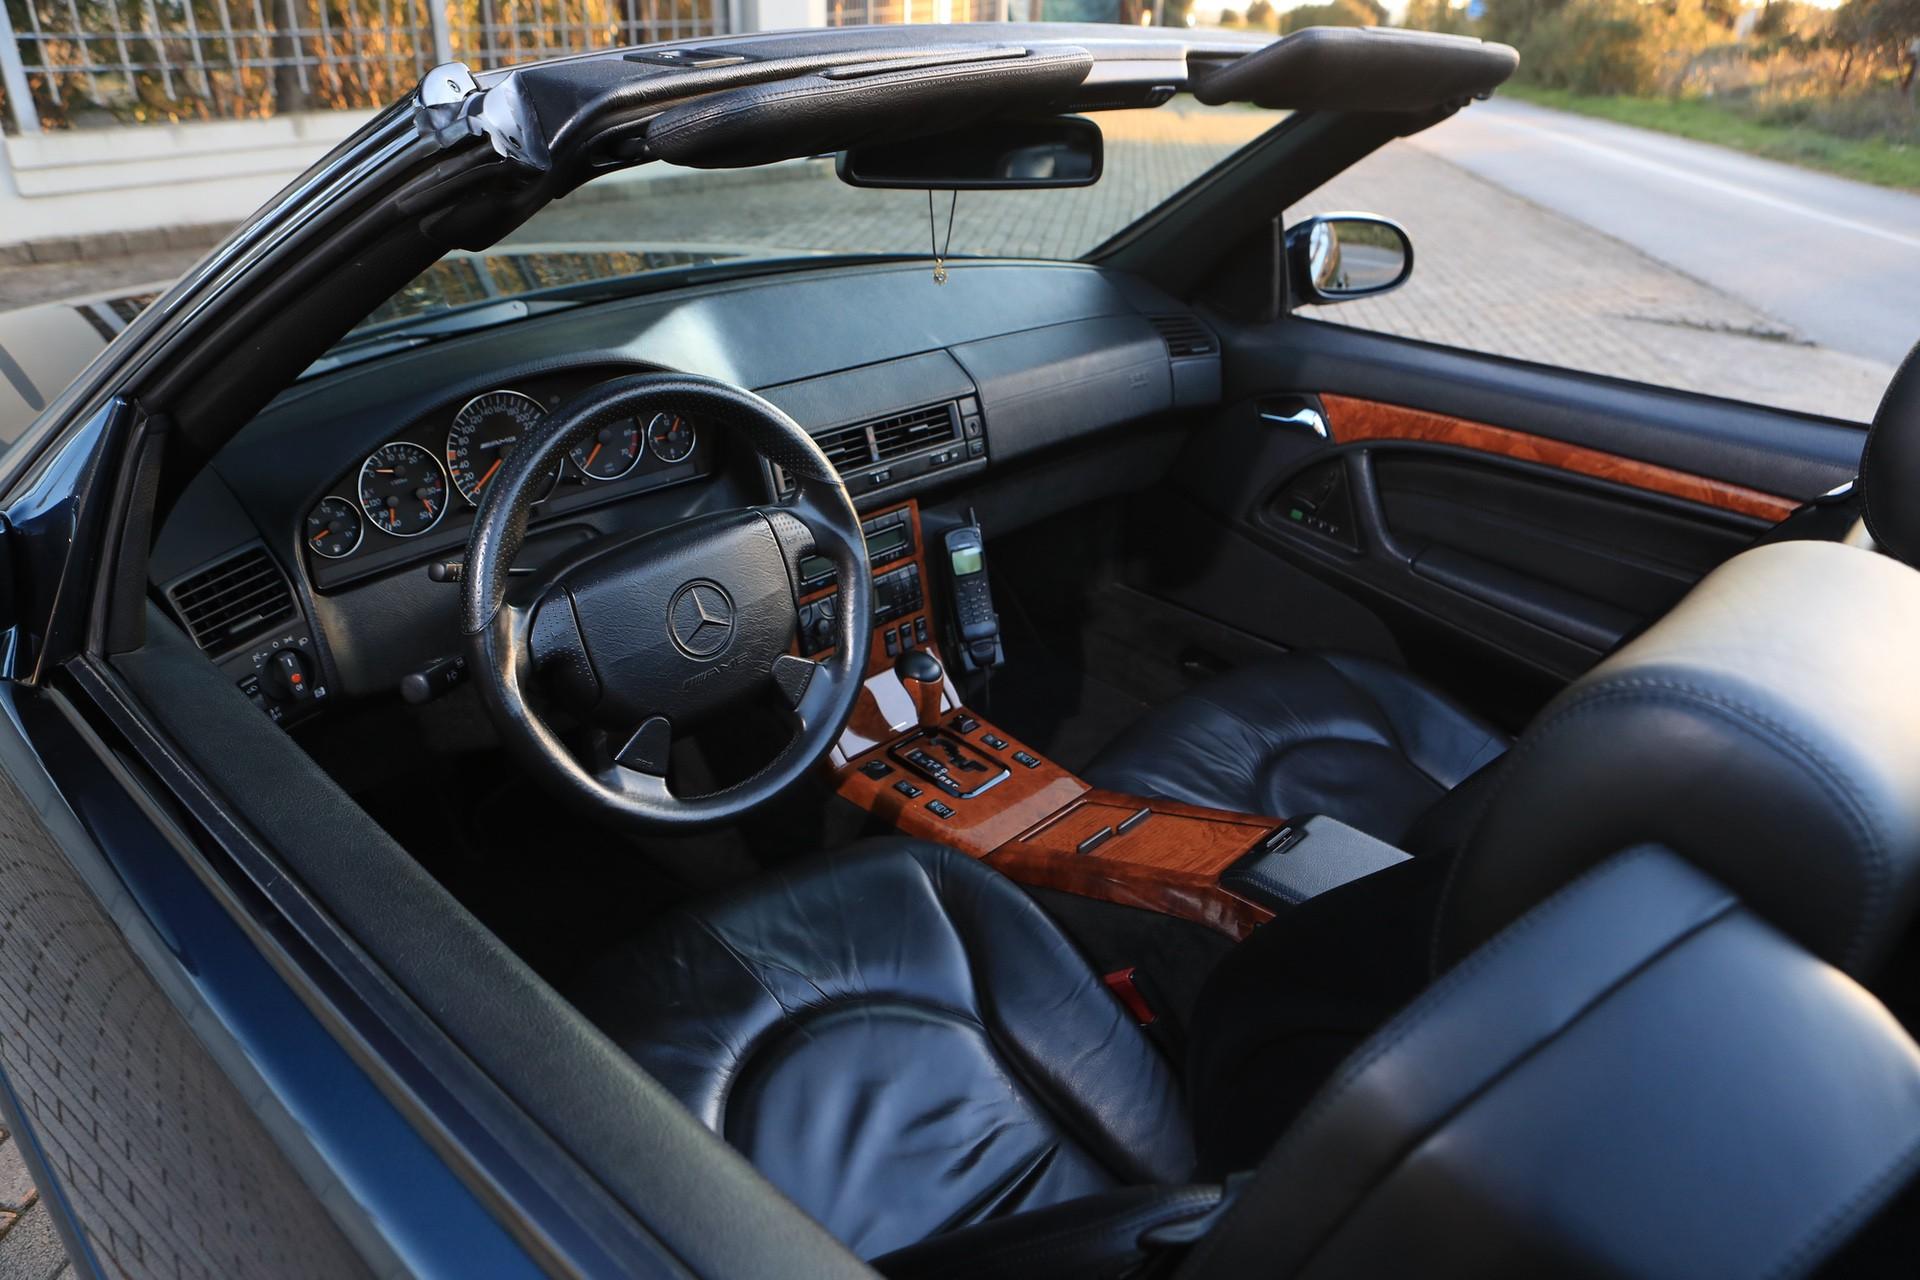 1999-Mercedes-Benz-SL-73-AMG-_9